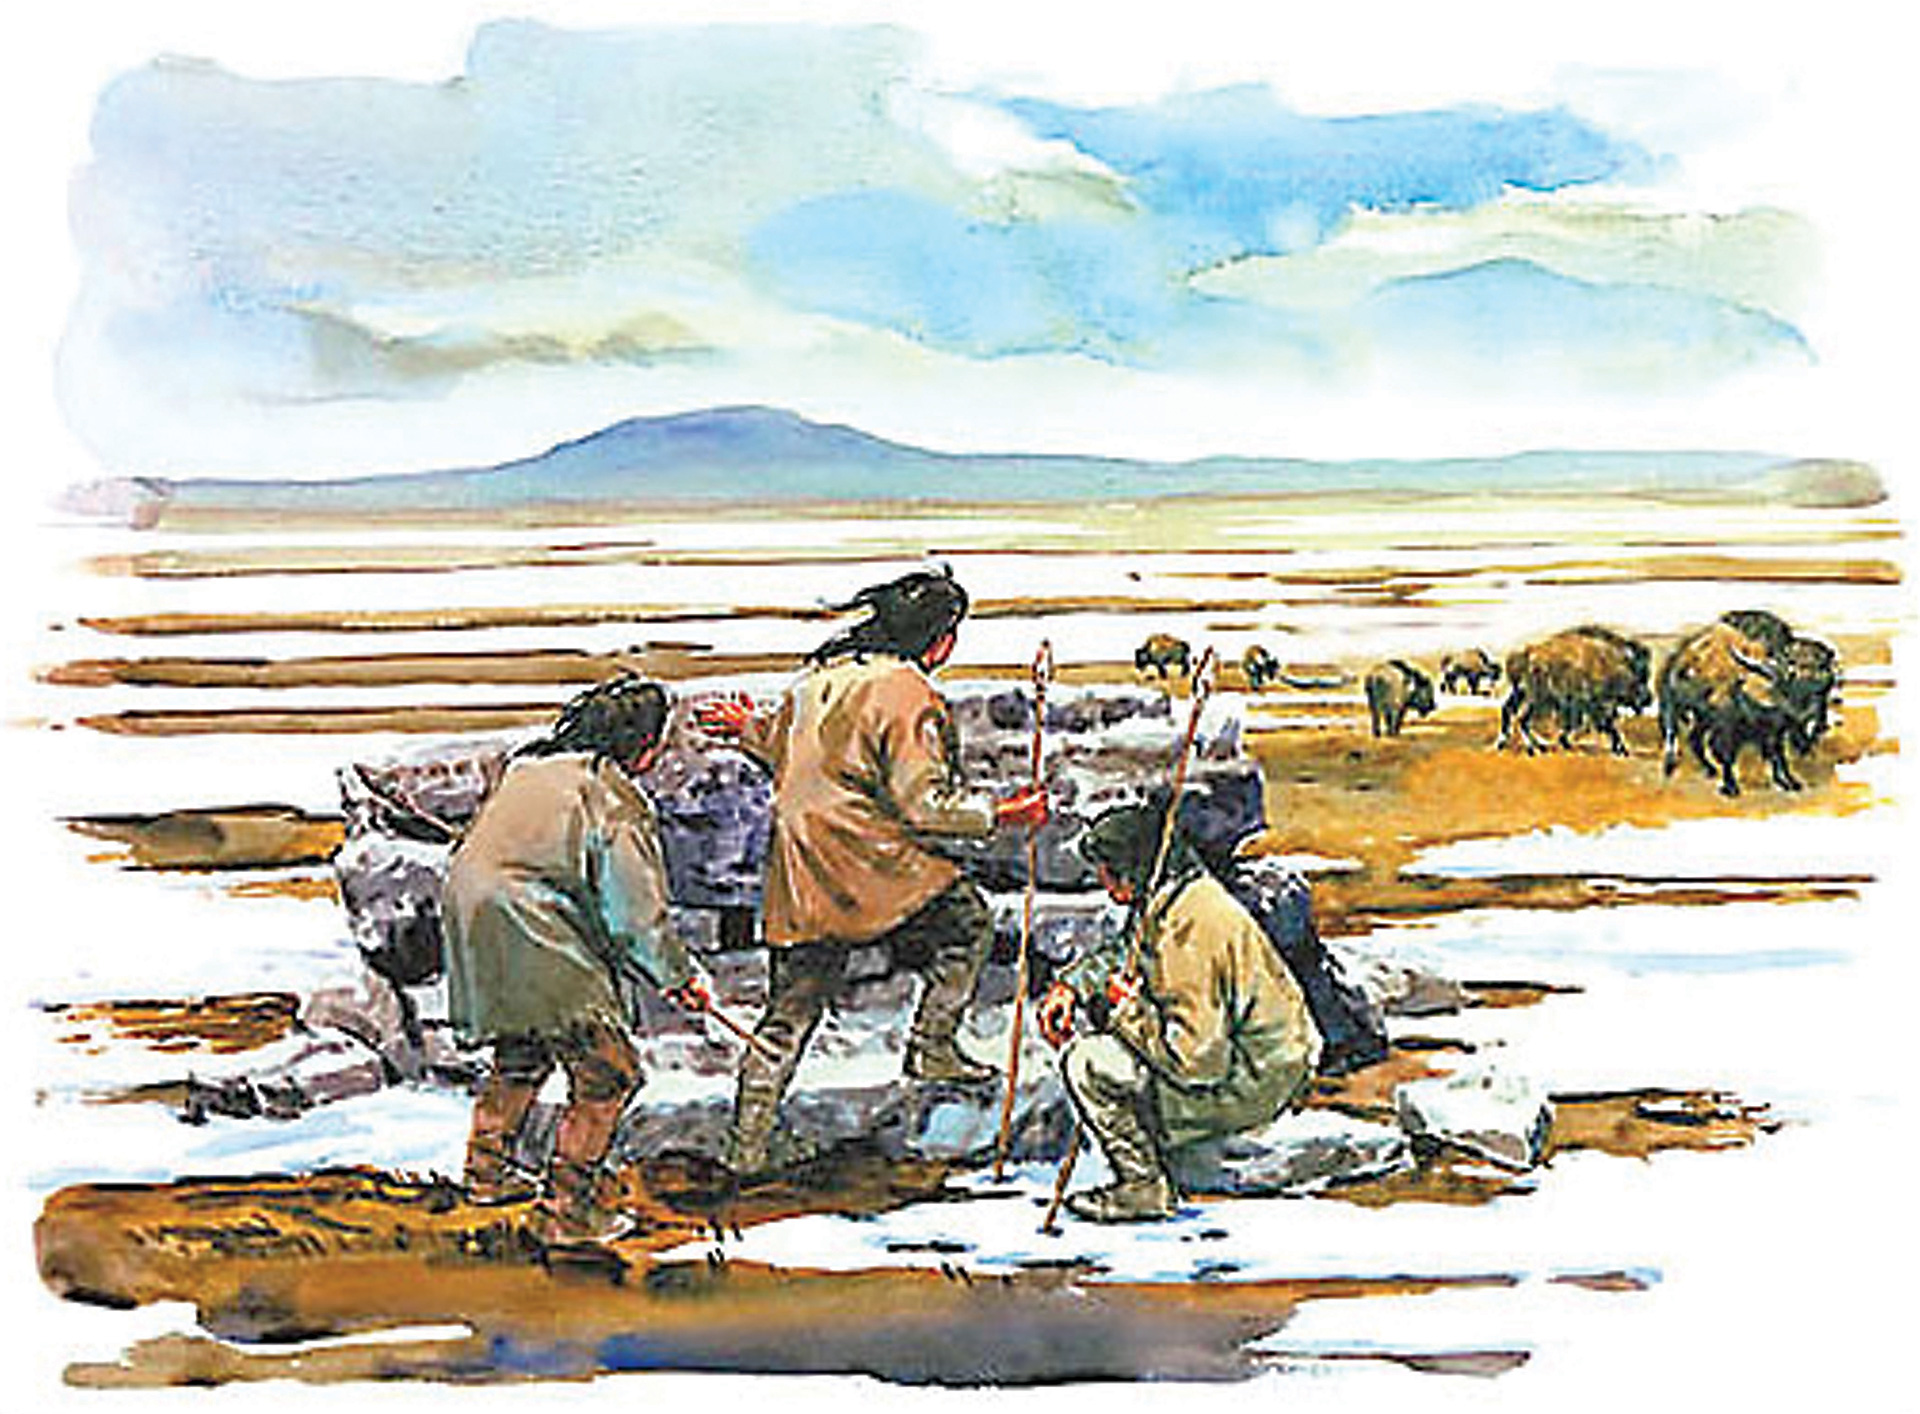 Paleo Indians Migrating South